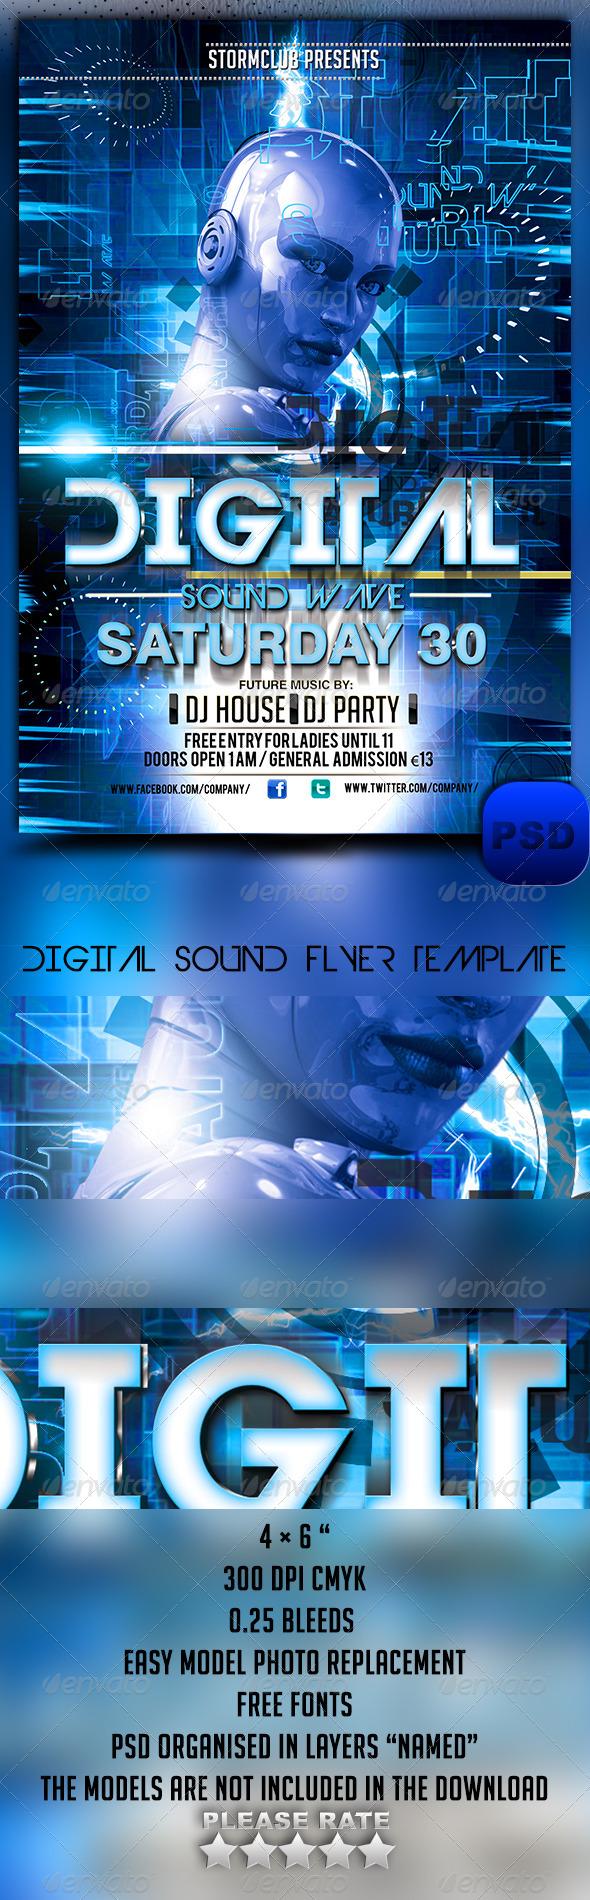 Digital Sound Flyer Template - Events Flyers